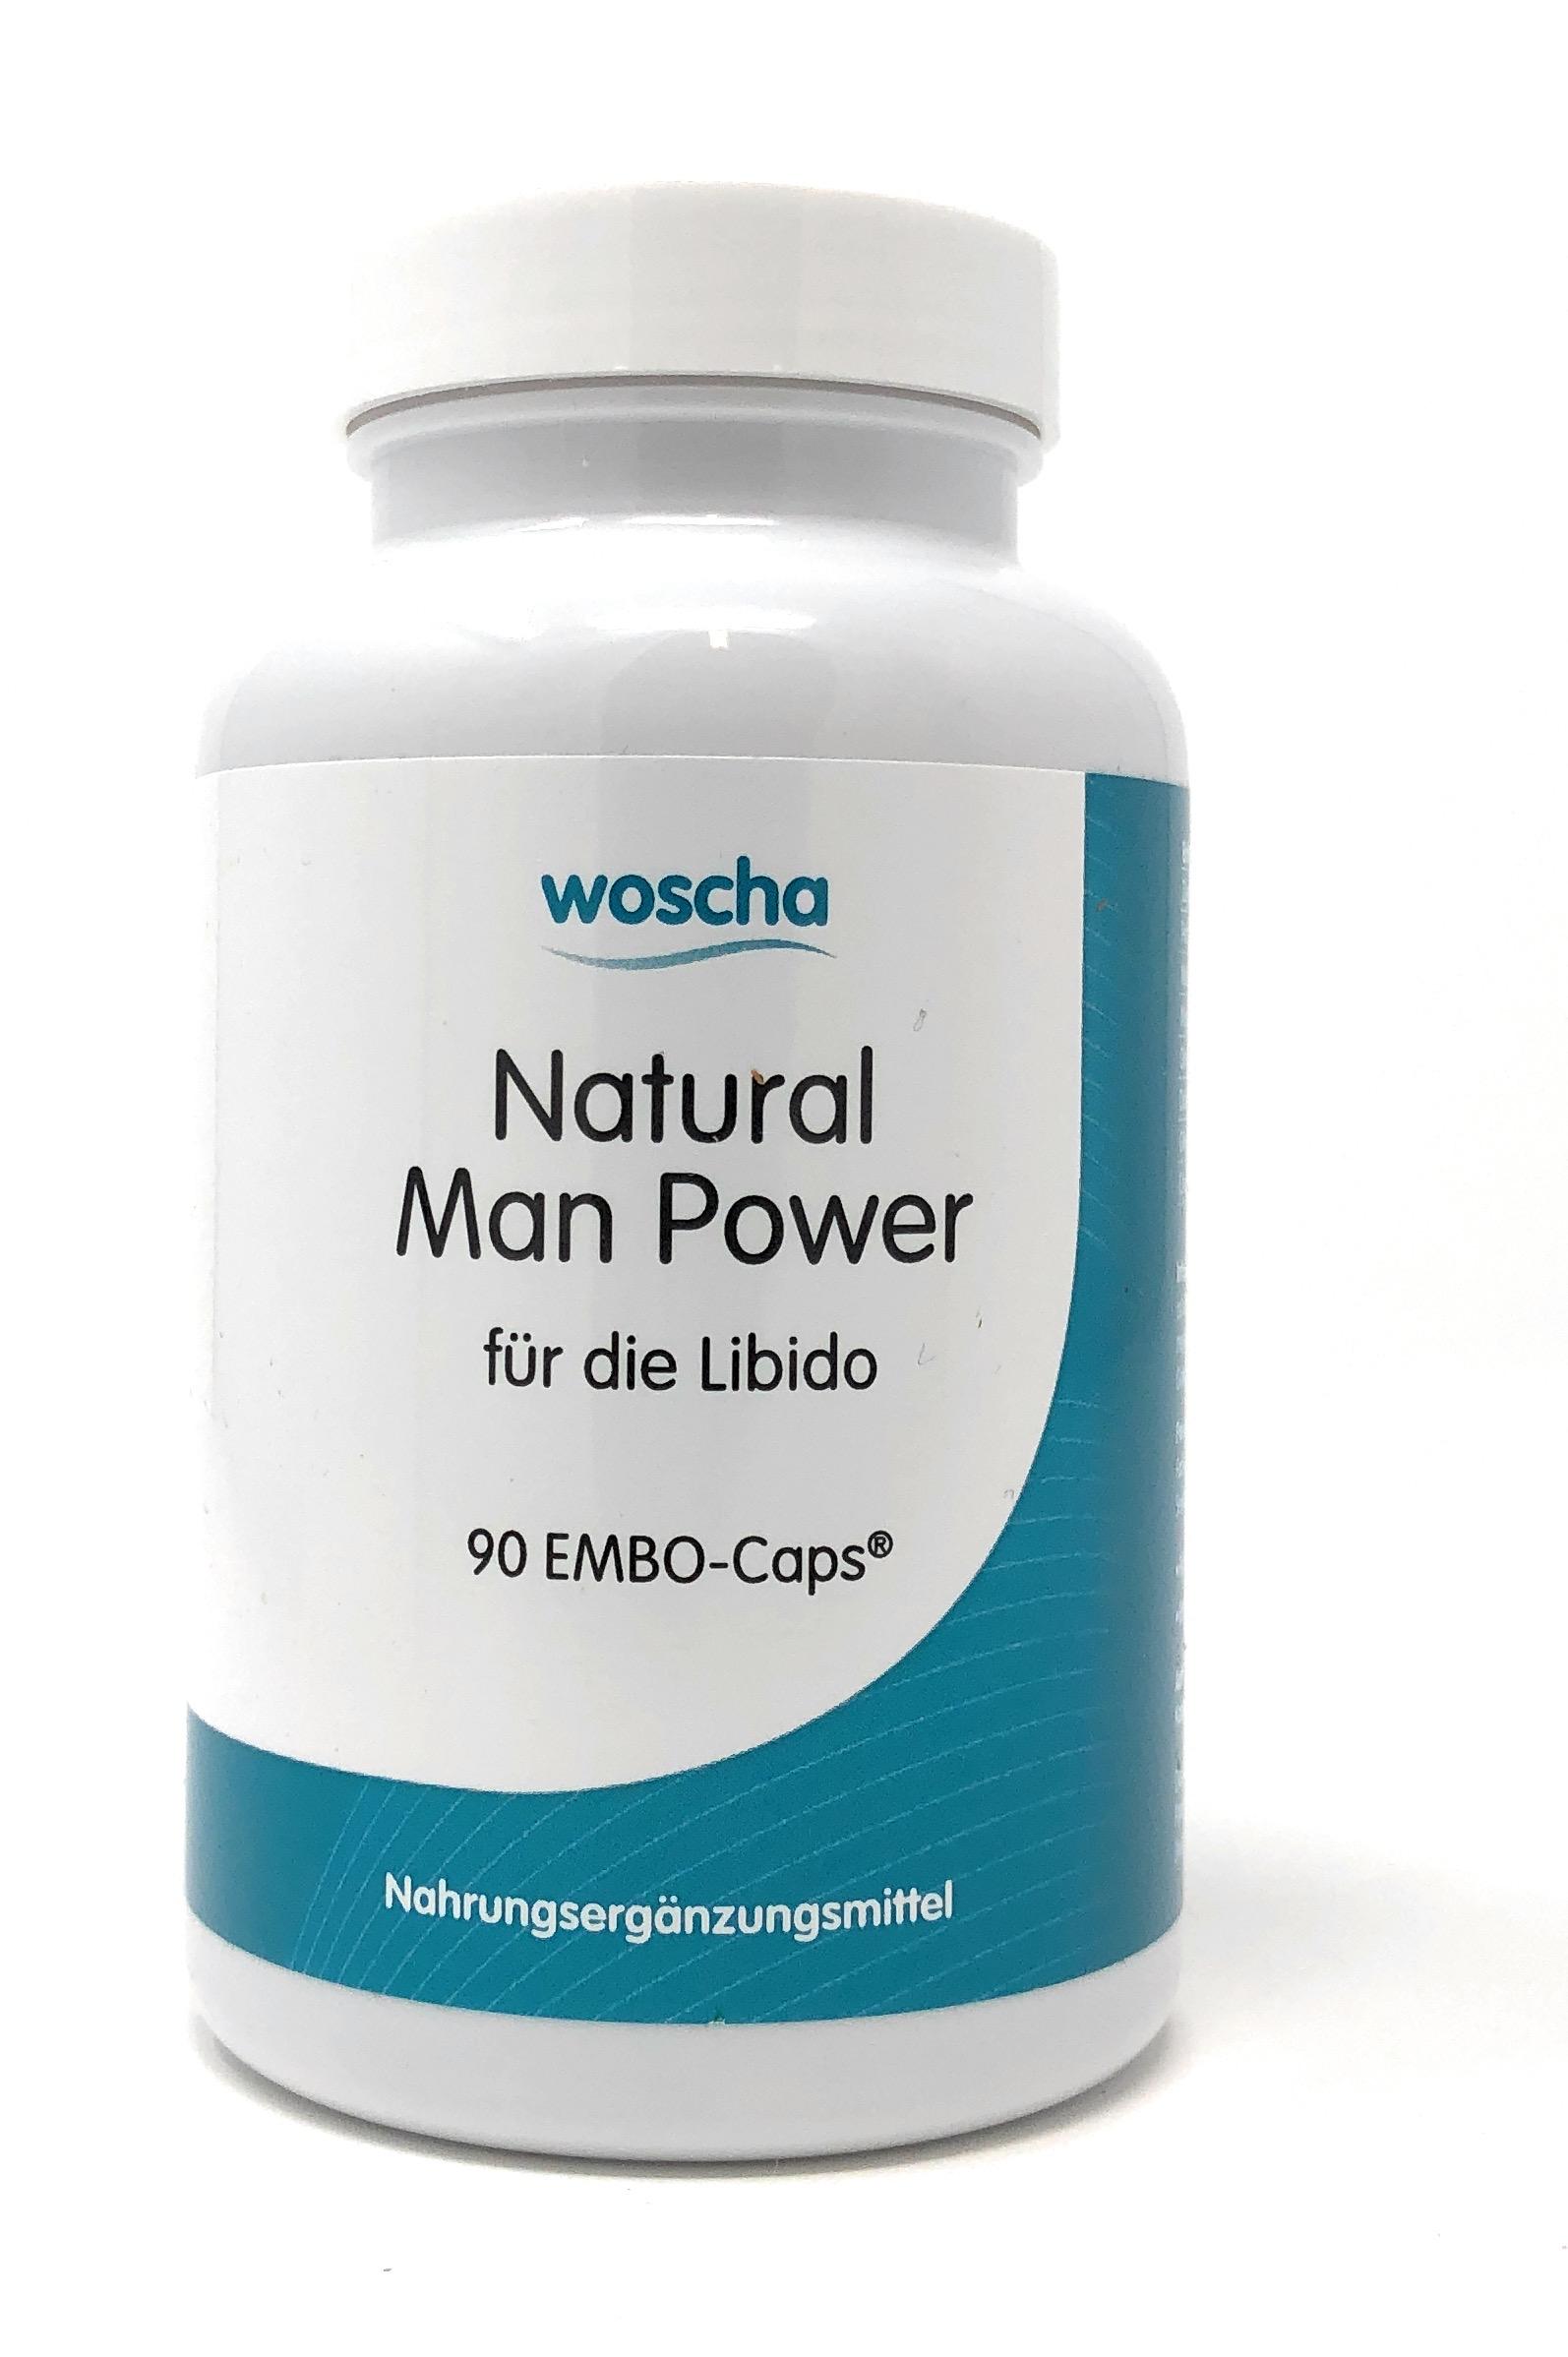 woscha Natural Man Power 90 Embo-Caps® (83g) (vegan)